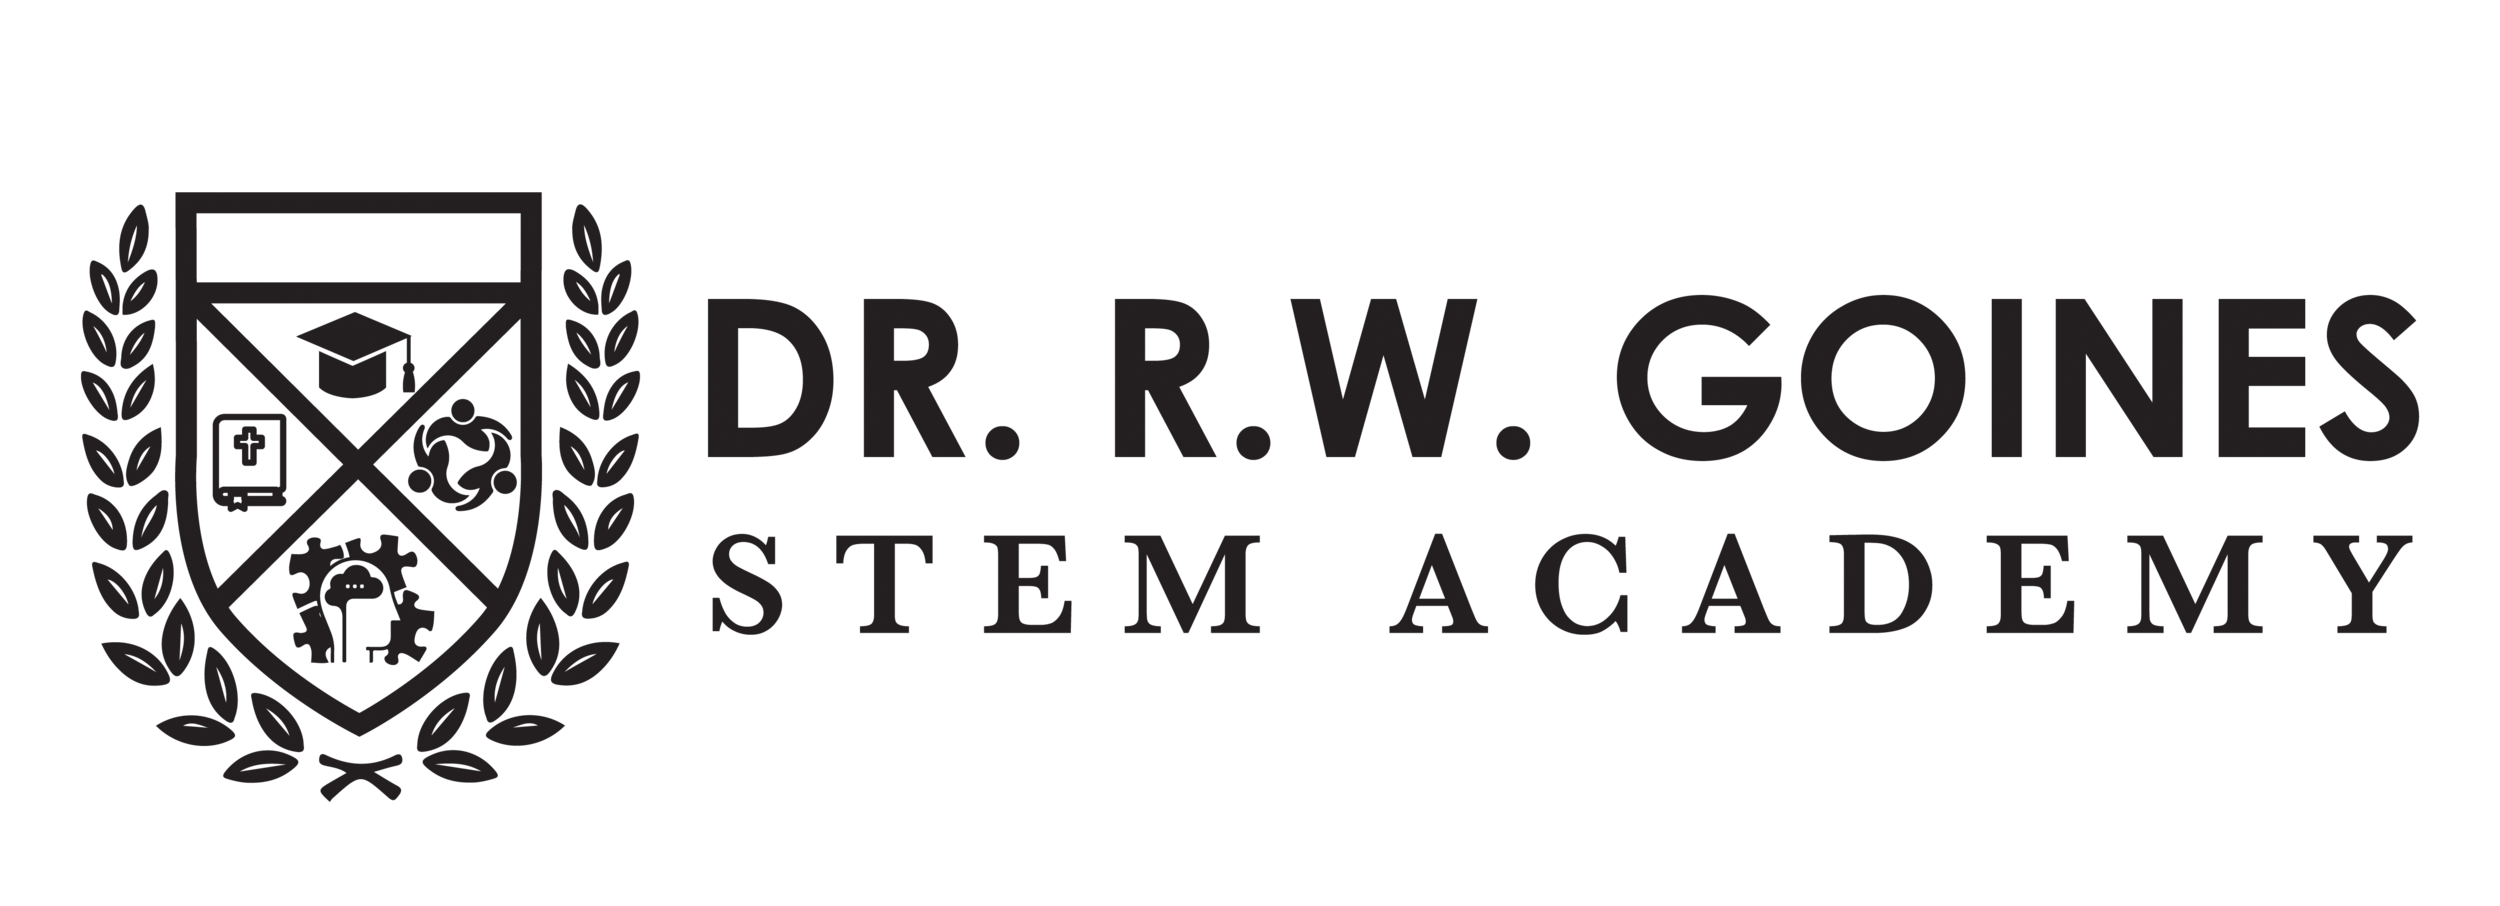 DR RW GOINES STEM ACADEMY FINAL Black.png